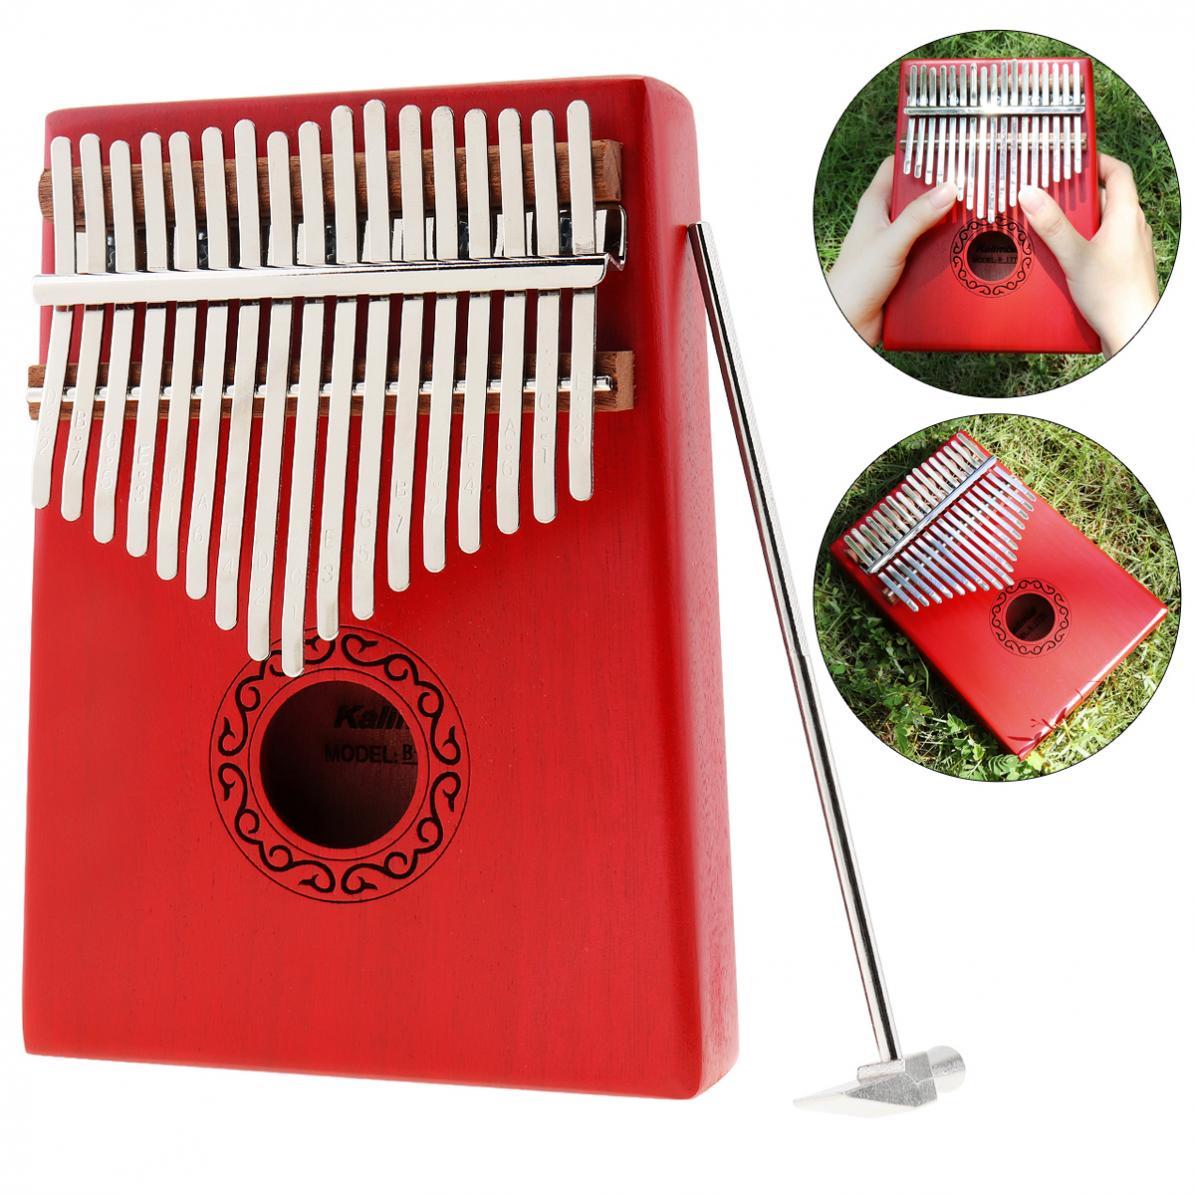 Thumb Piano 17 Key Red Kalimba Single Board Mahogany Mbira Mini Keyboard Instrument with Complete Accessories